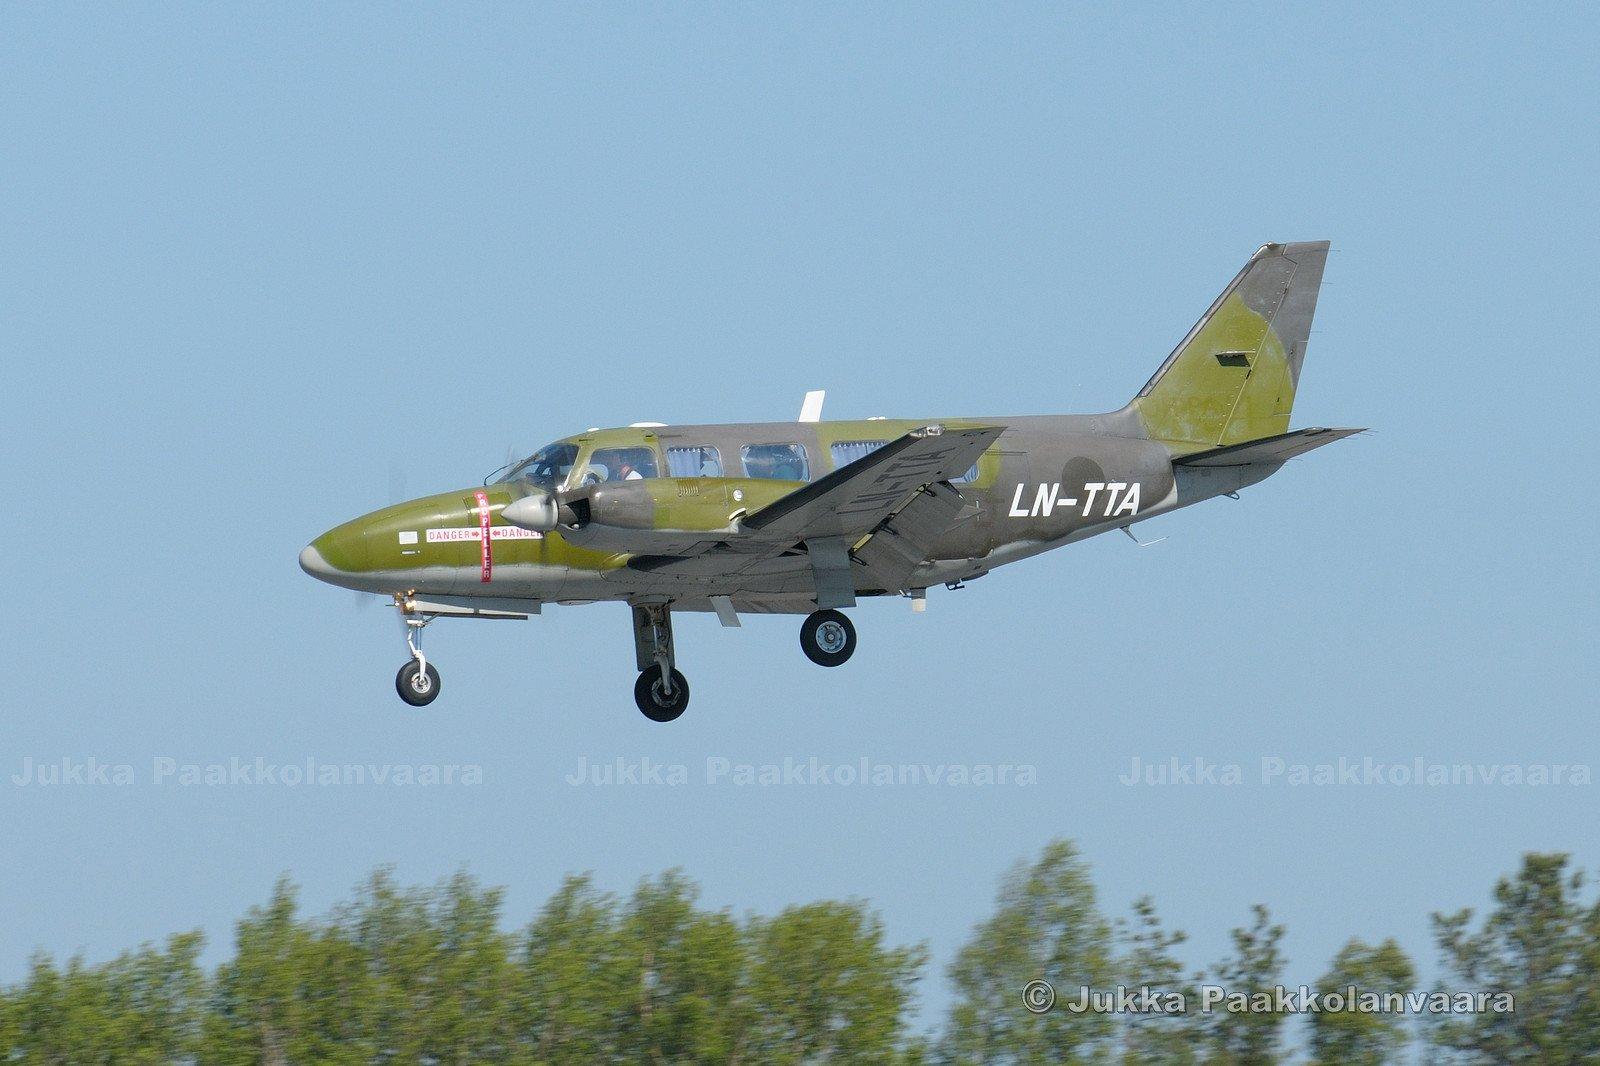 Piper PA-31-350 Navajo, LN-TTA, 2018-05-25